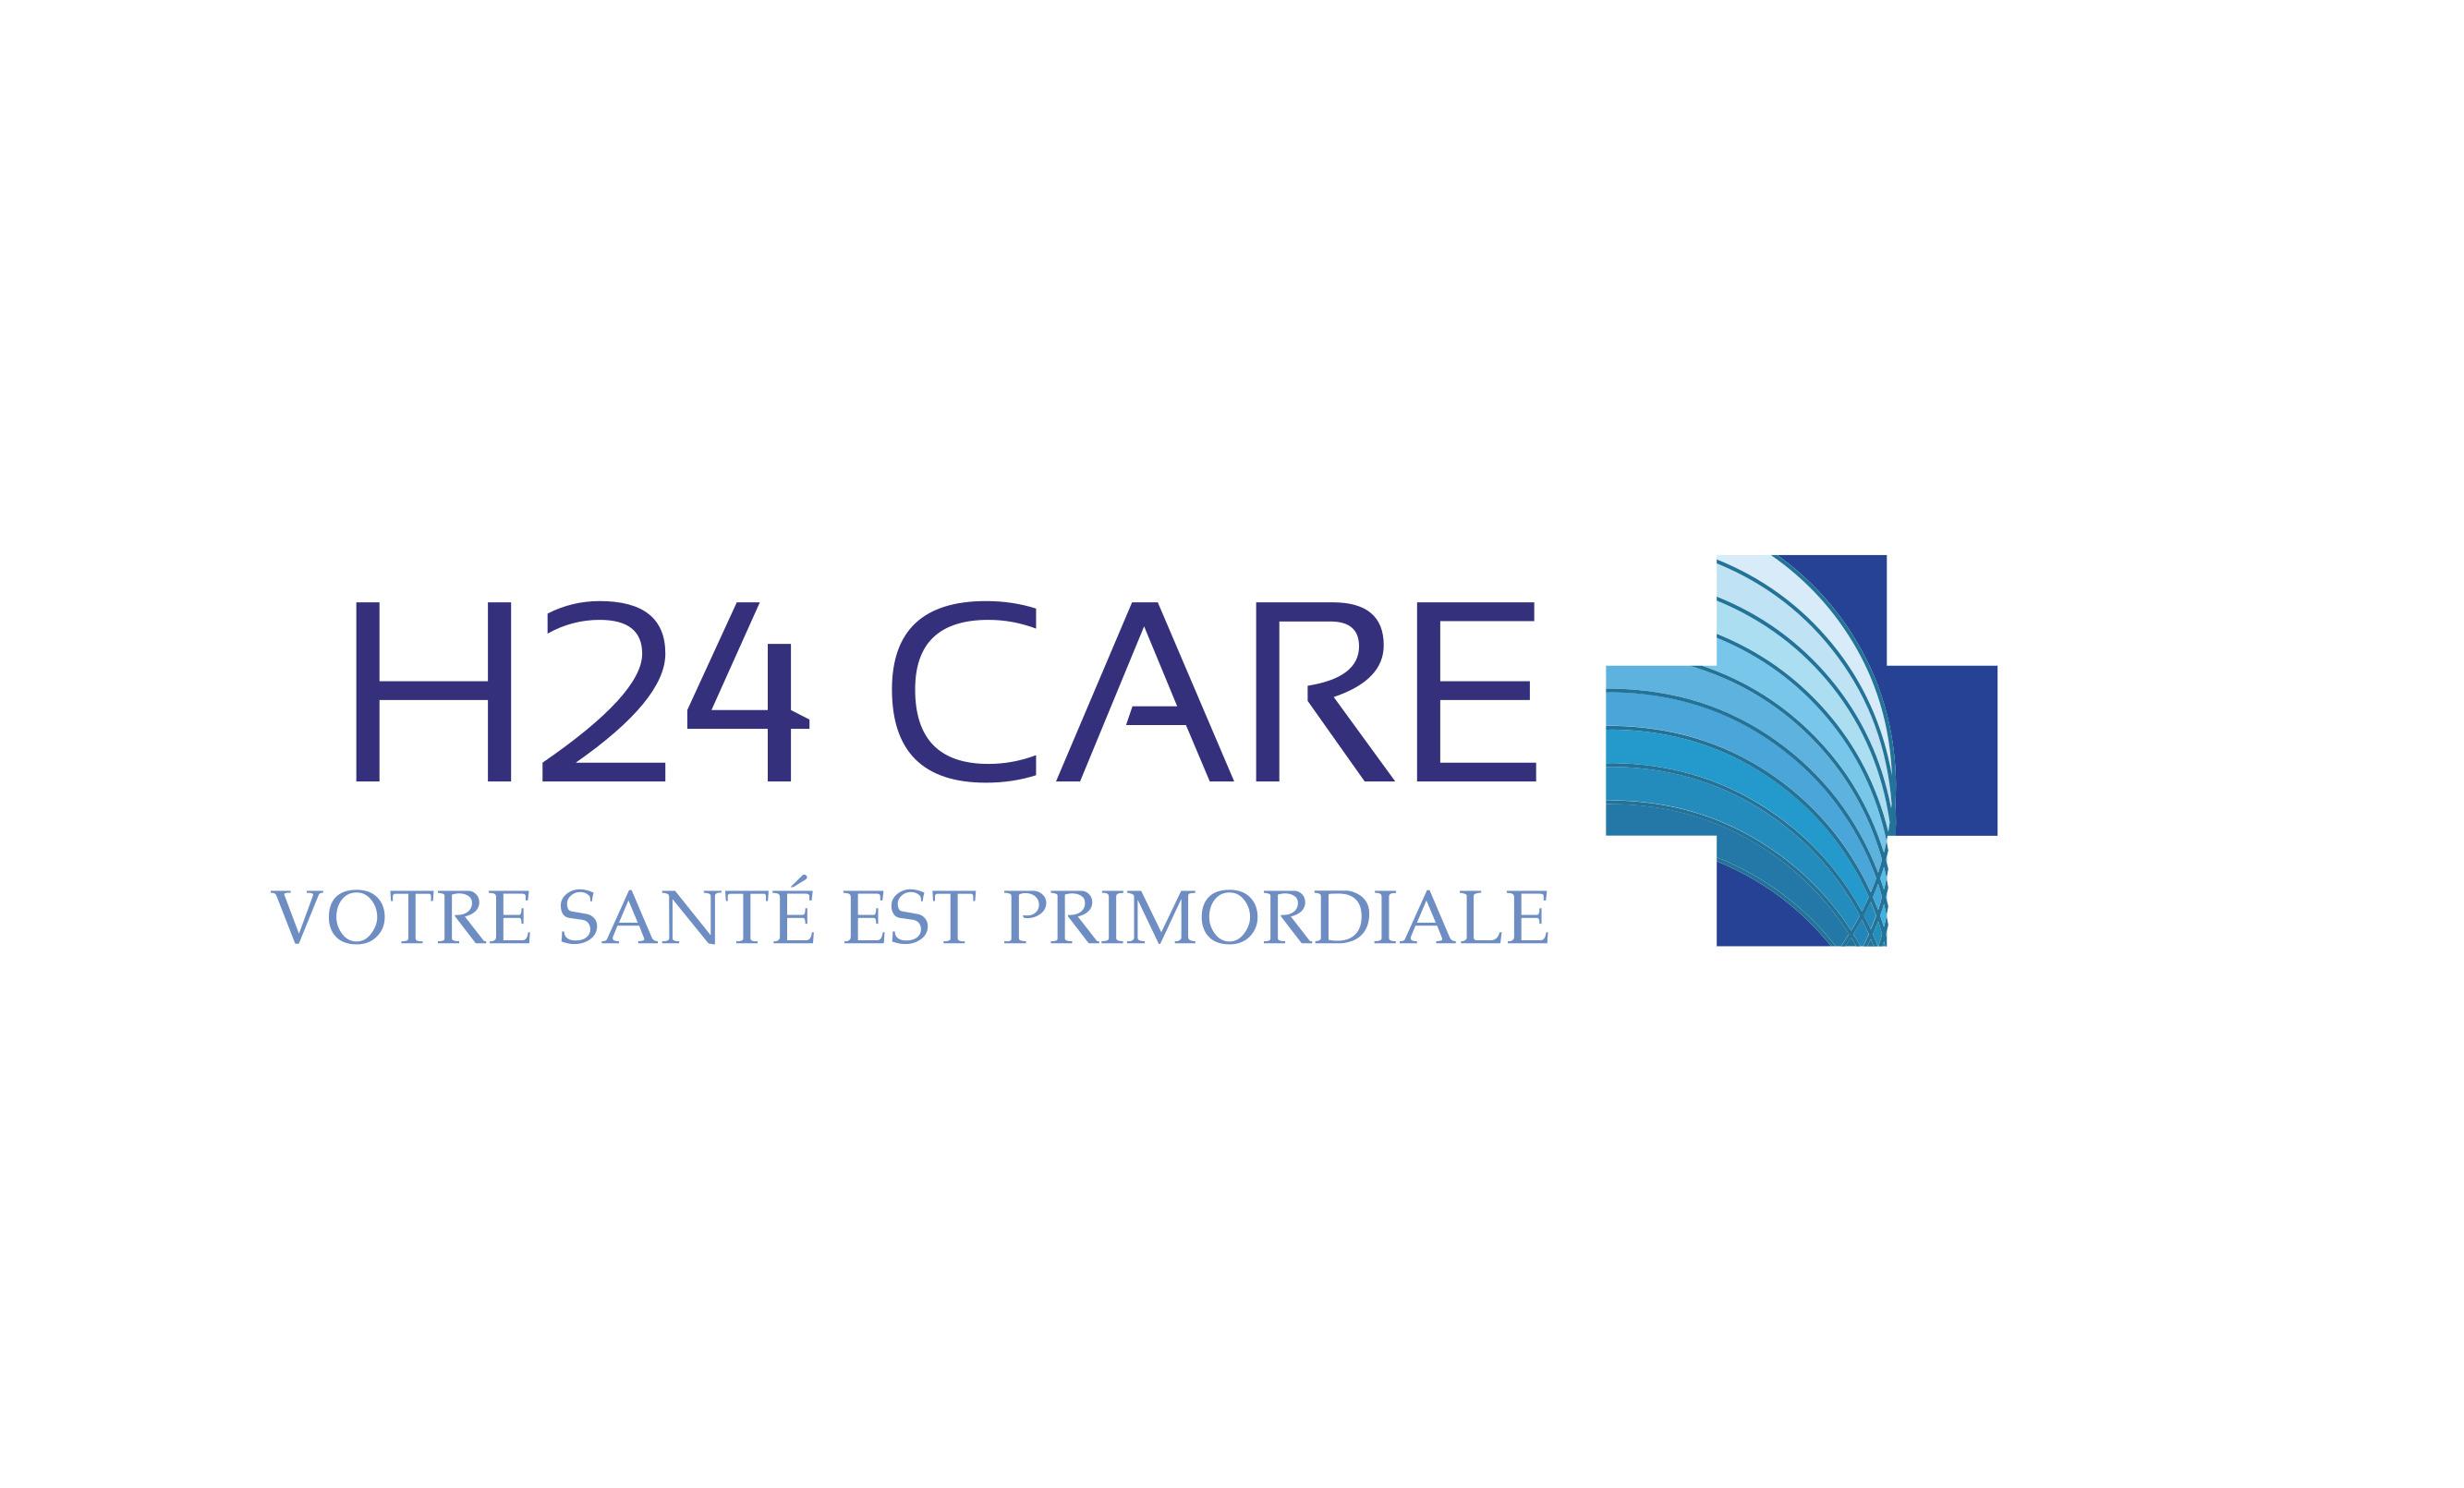 H24 CARE